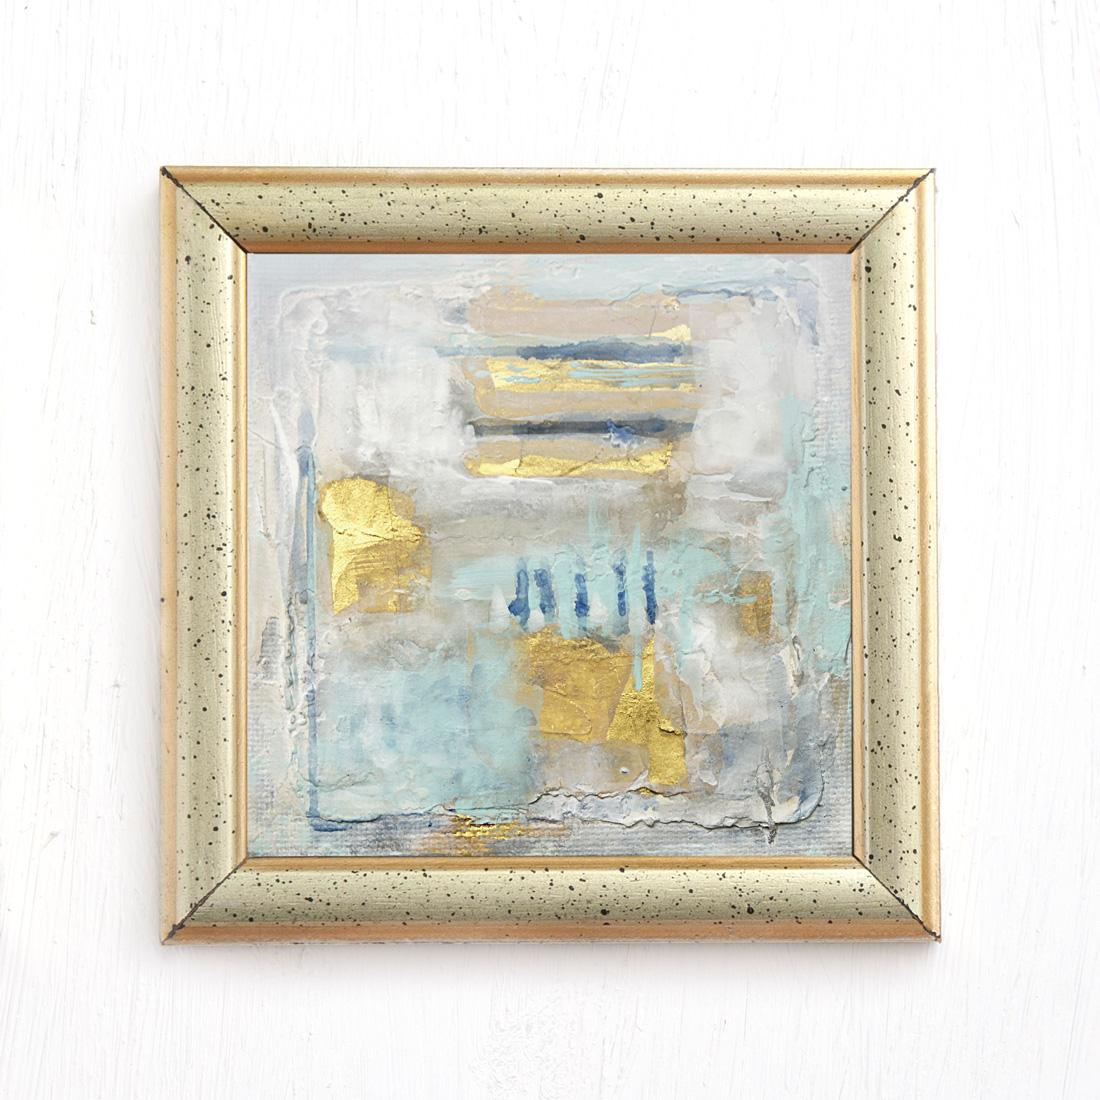 Sticks - abstract mixed media painting mint gold Navy blue by Jennifer Lorton - framed.jpg